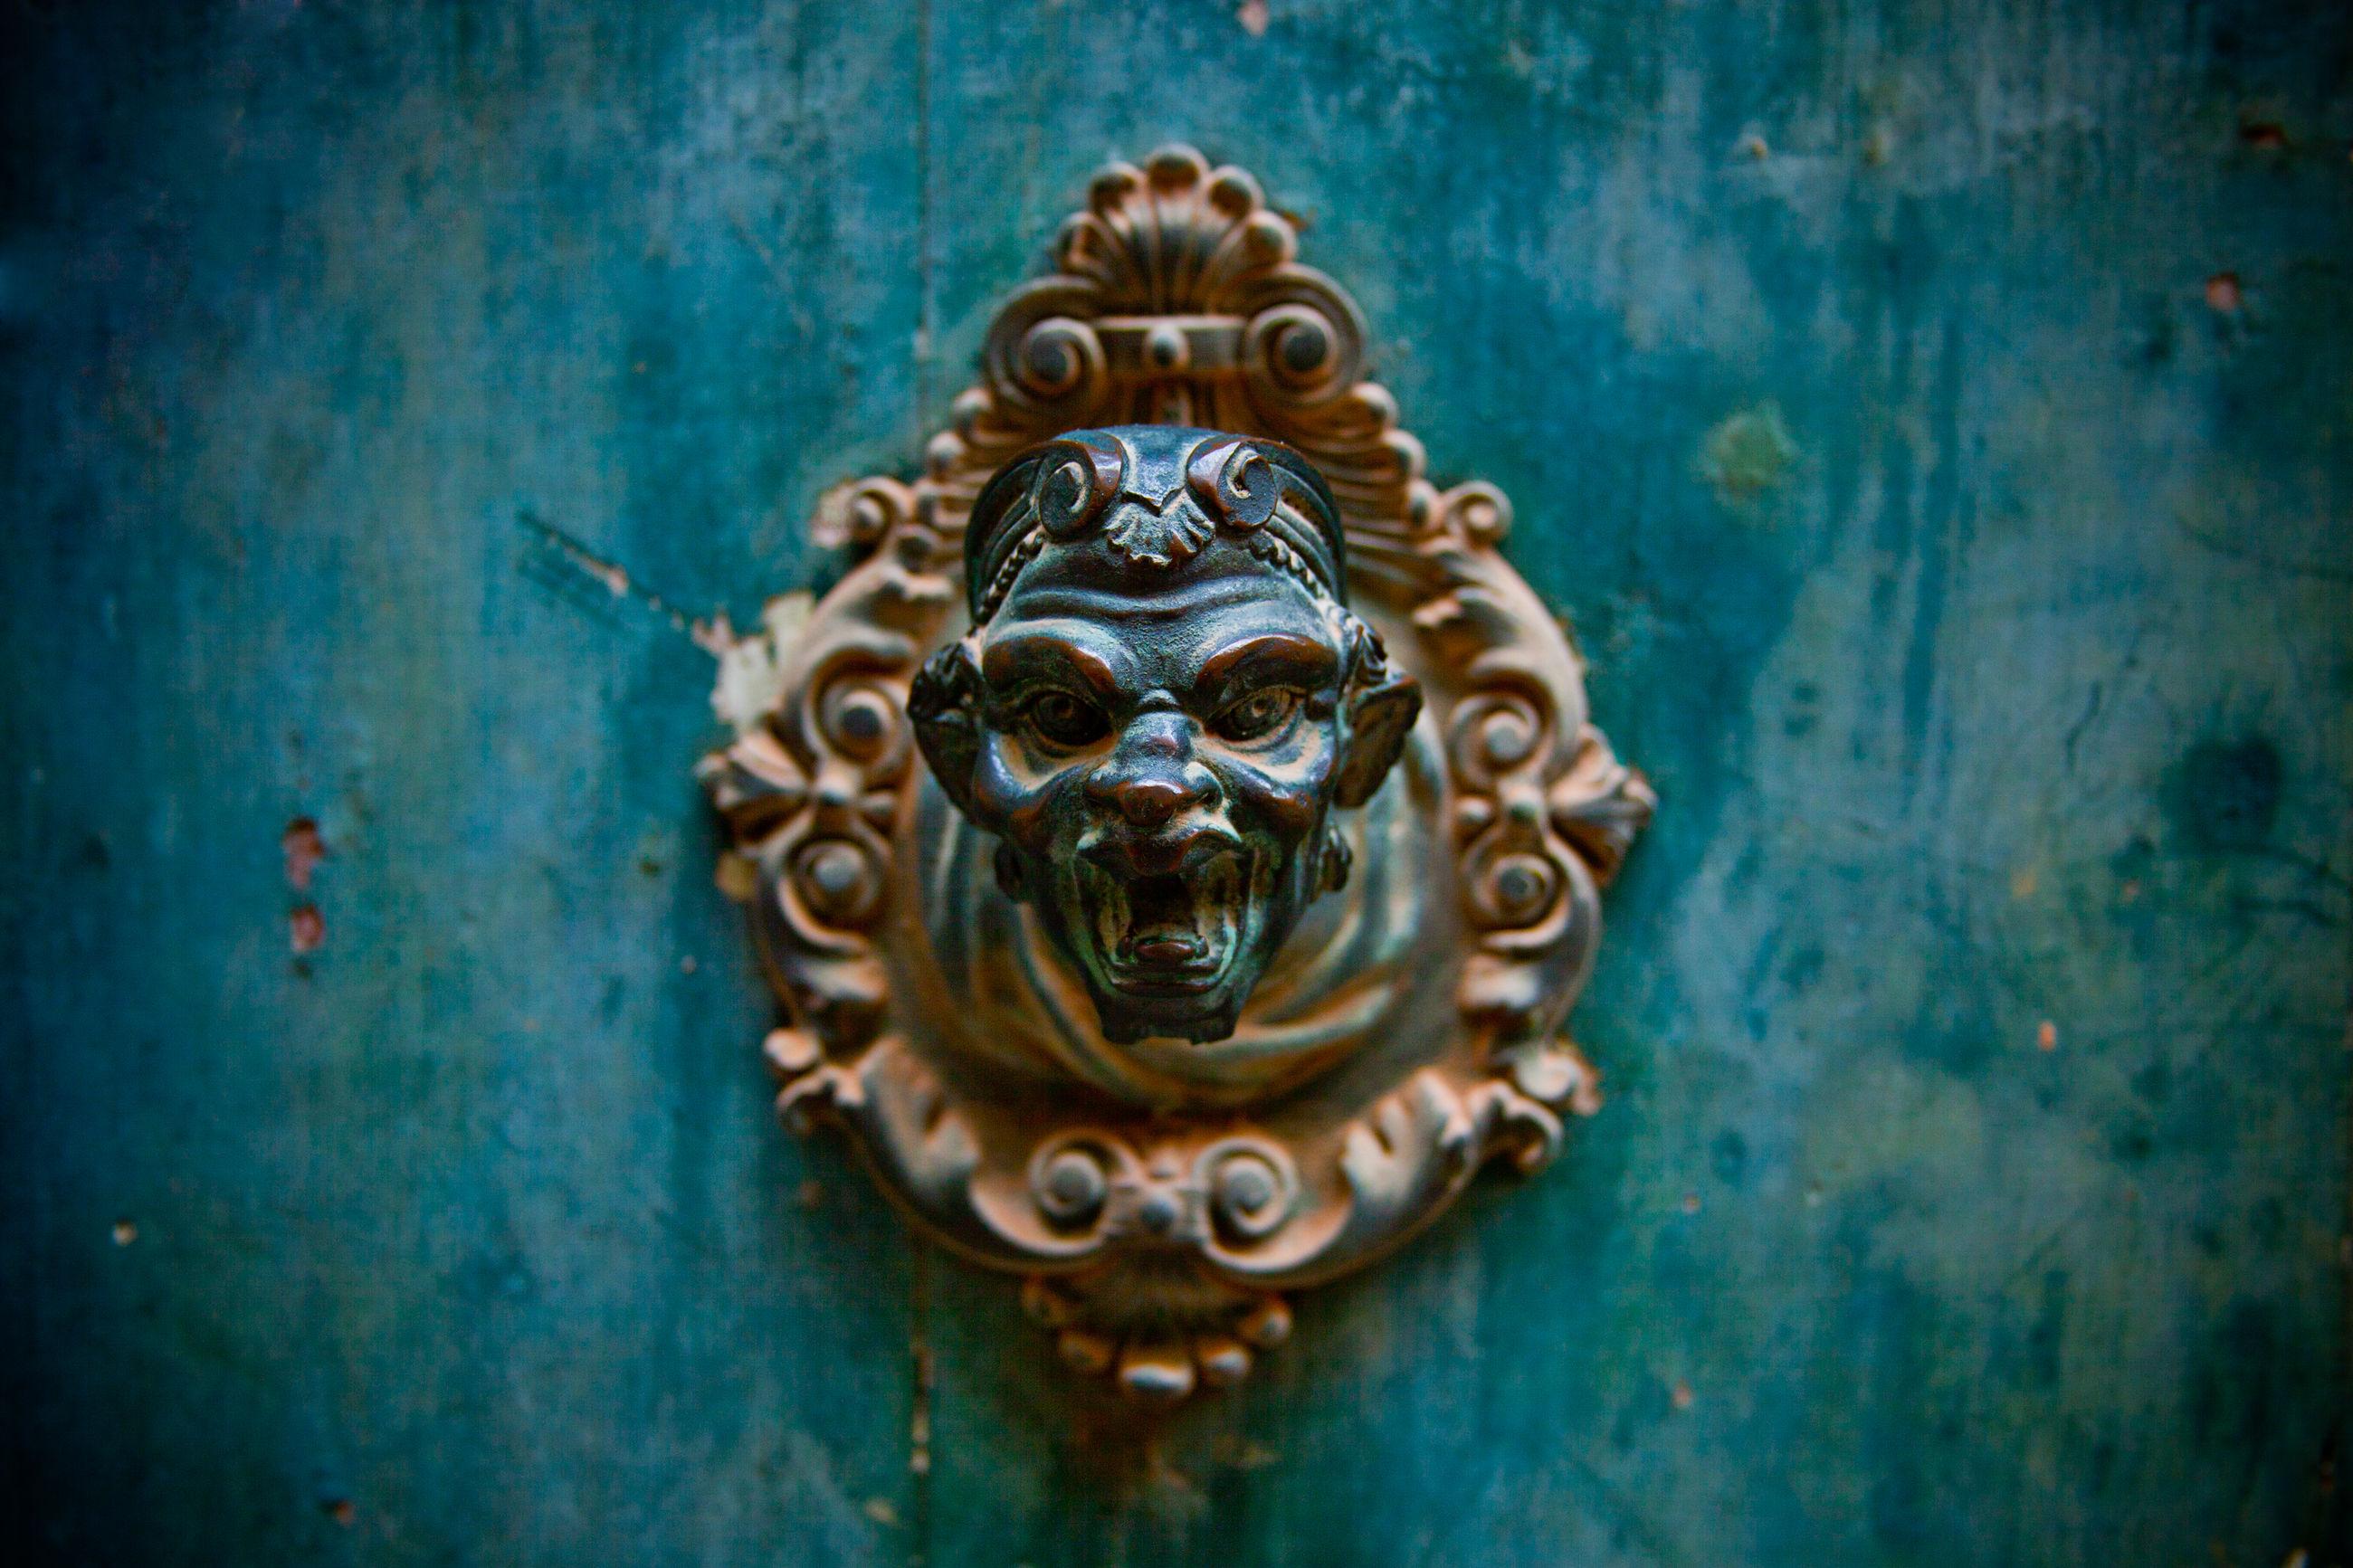 Close-up of vintage knocker on green door